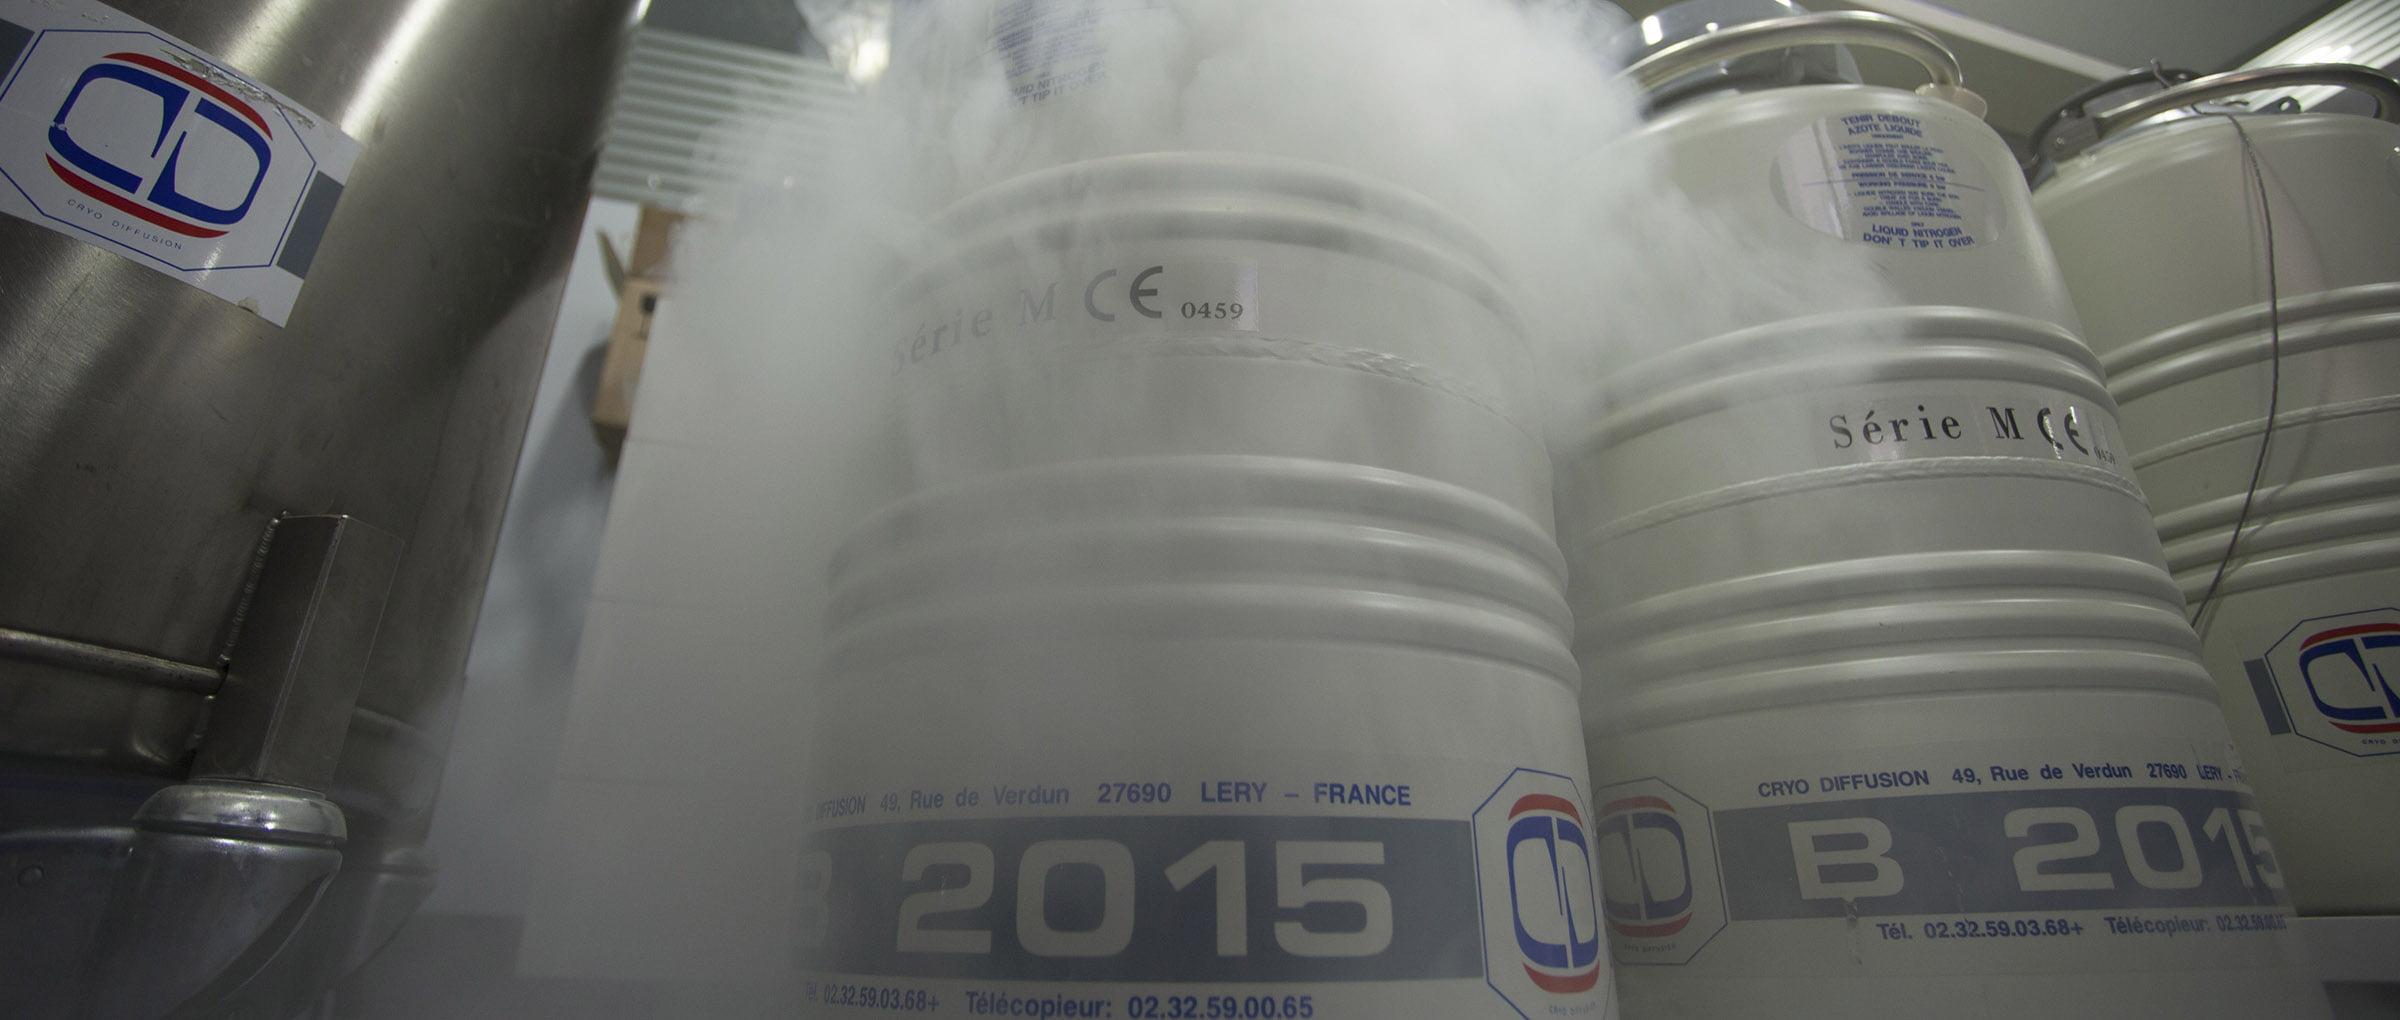 Cryoconservation de sperme - JANVIER LABS